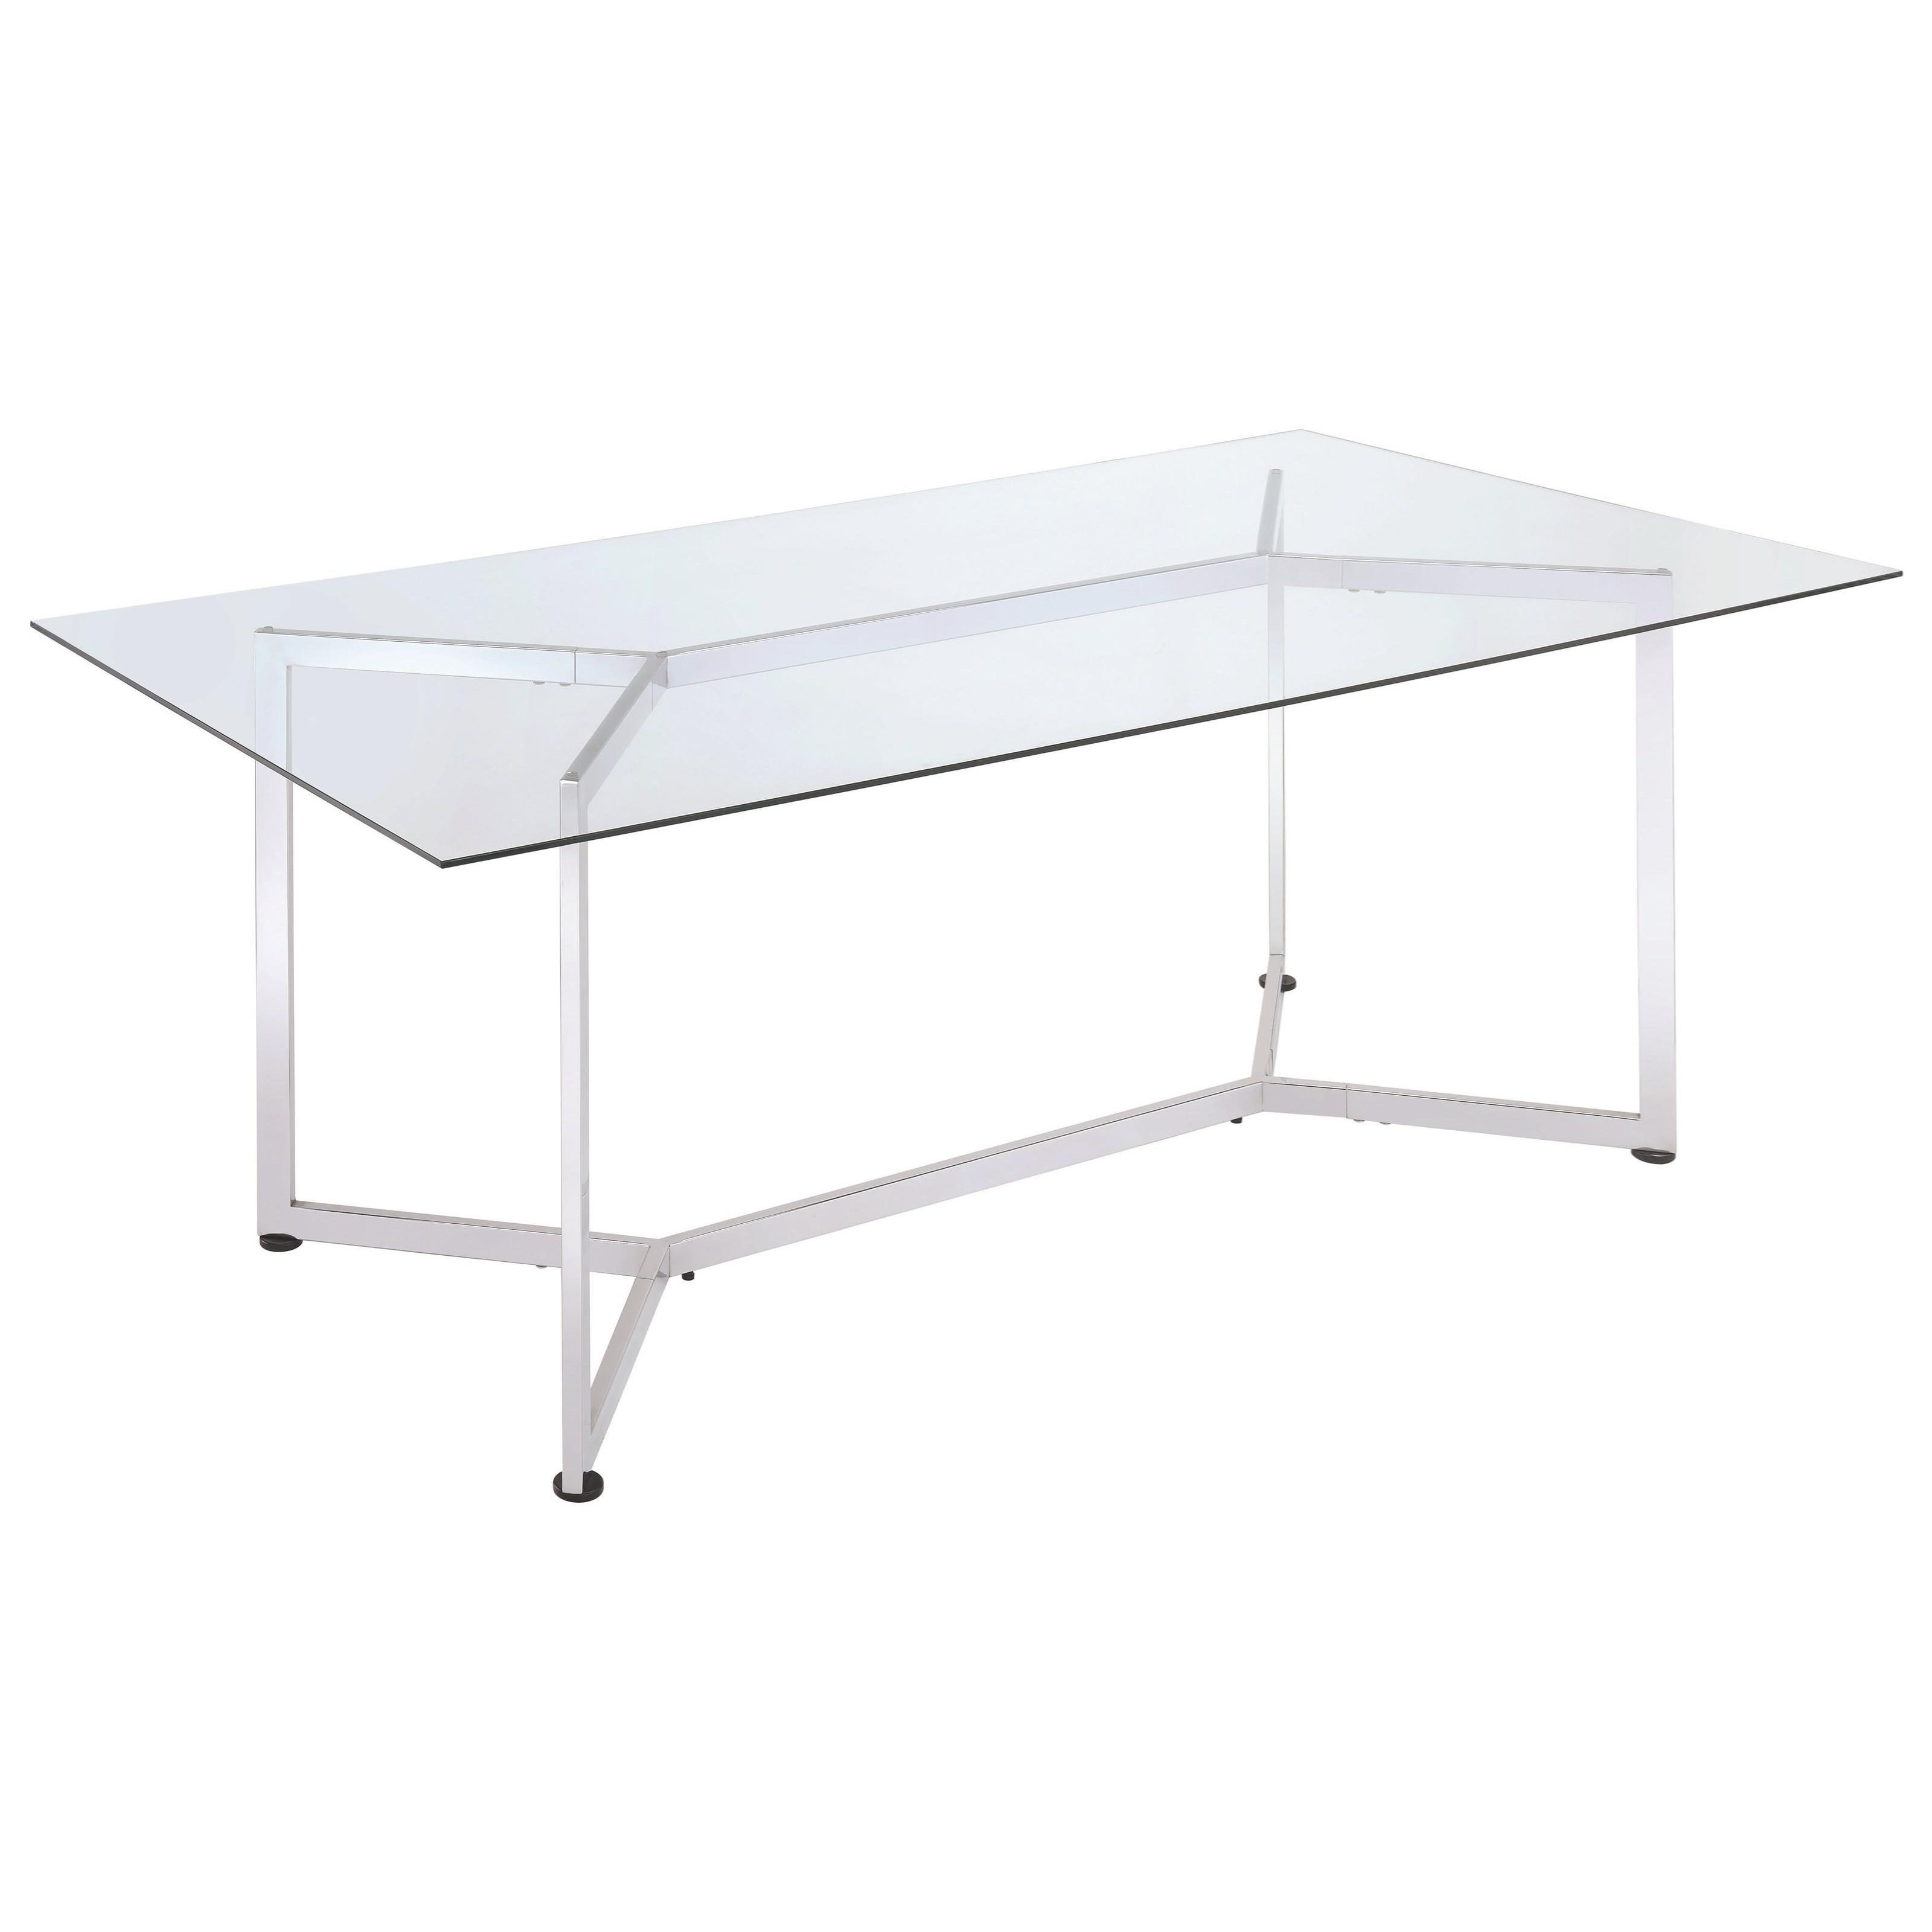 Coaster augustin 106901 rectangular glass dining table for Rectangular glass dining table